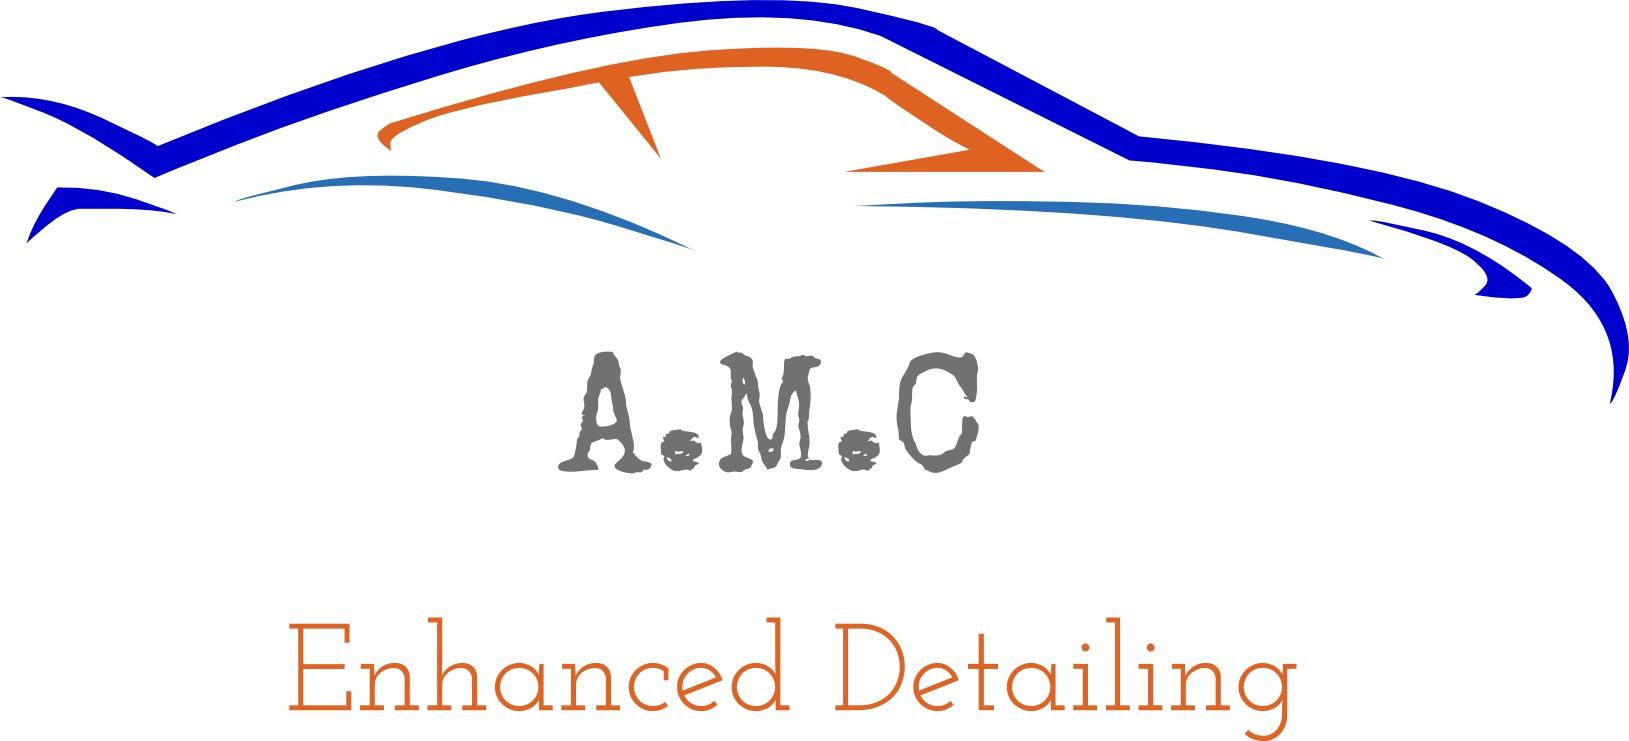 Business Profile: AMC Enhanced Detailing